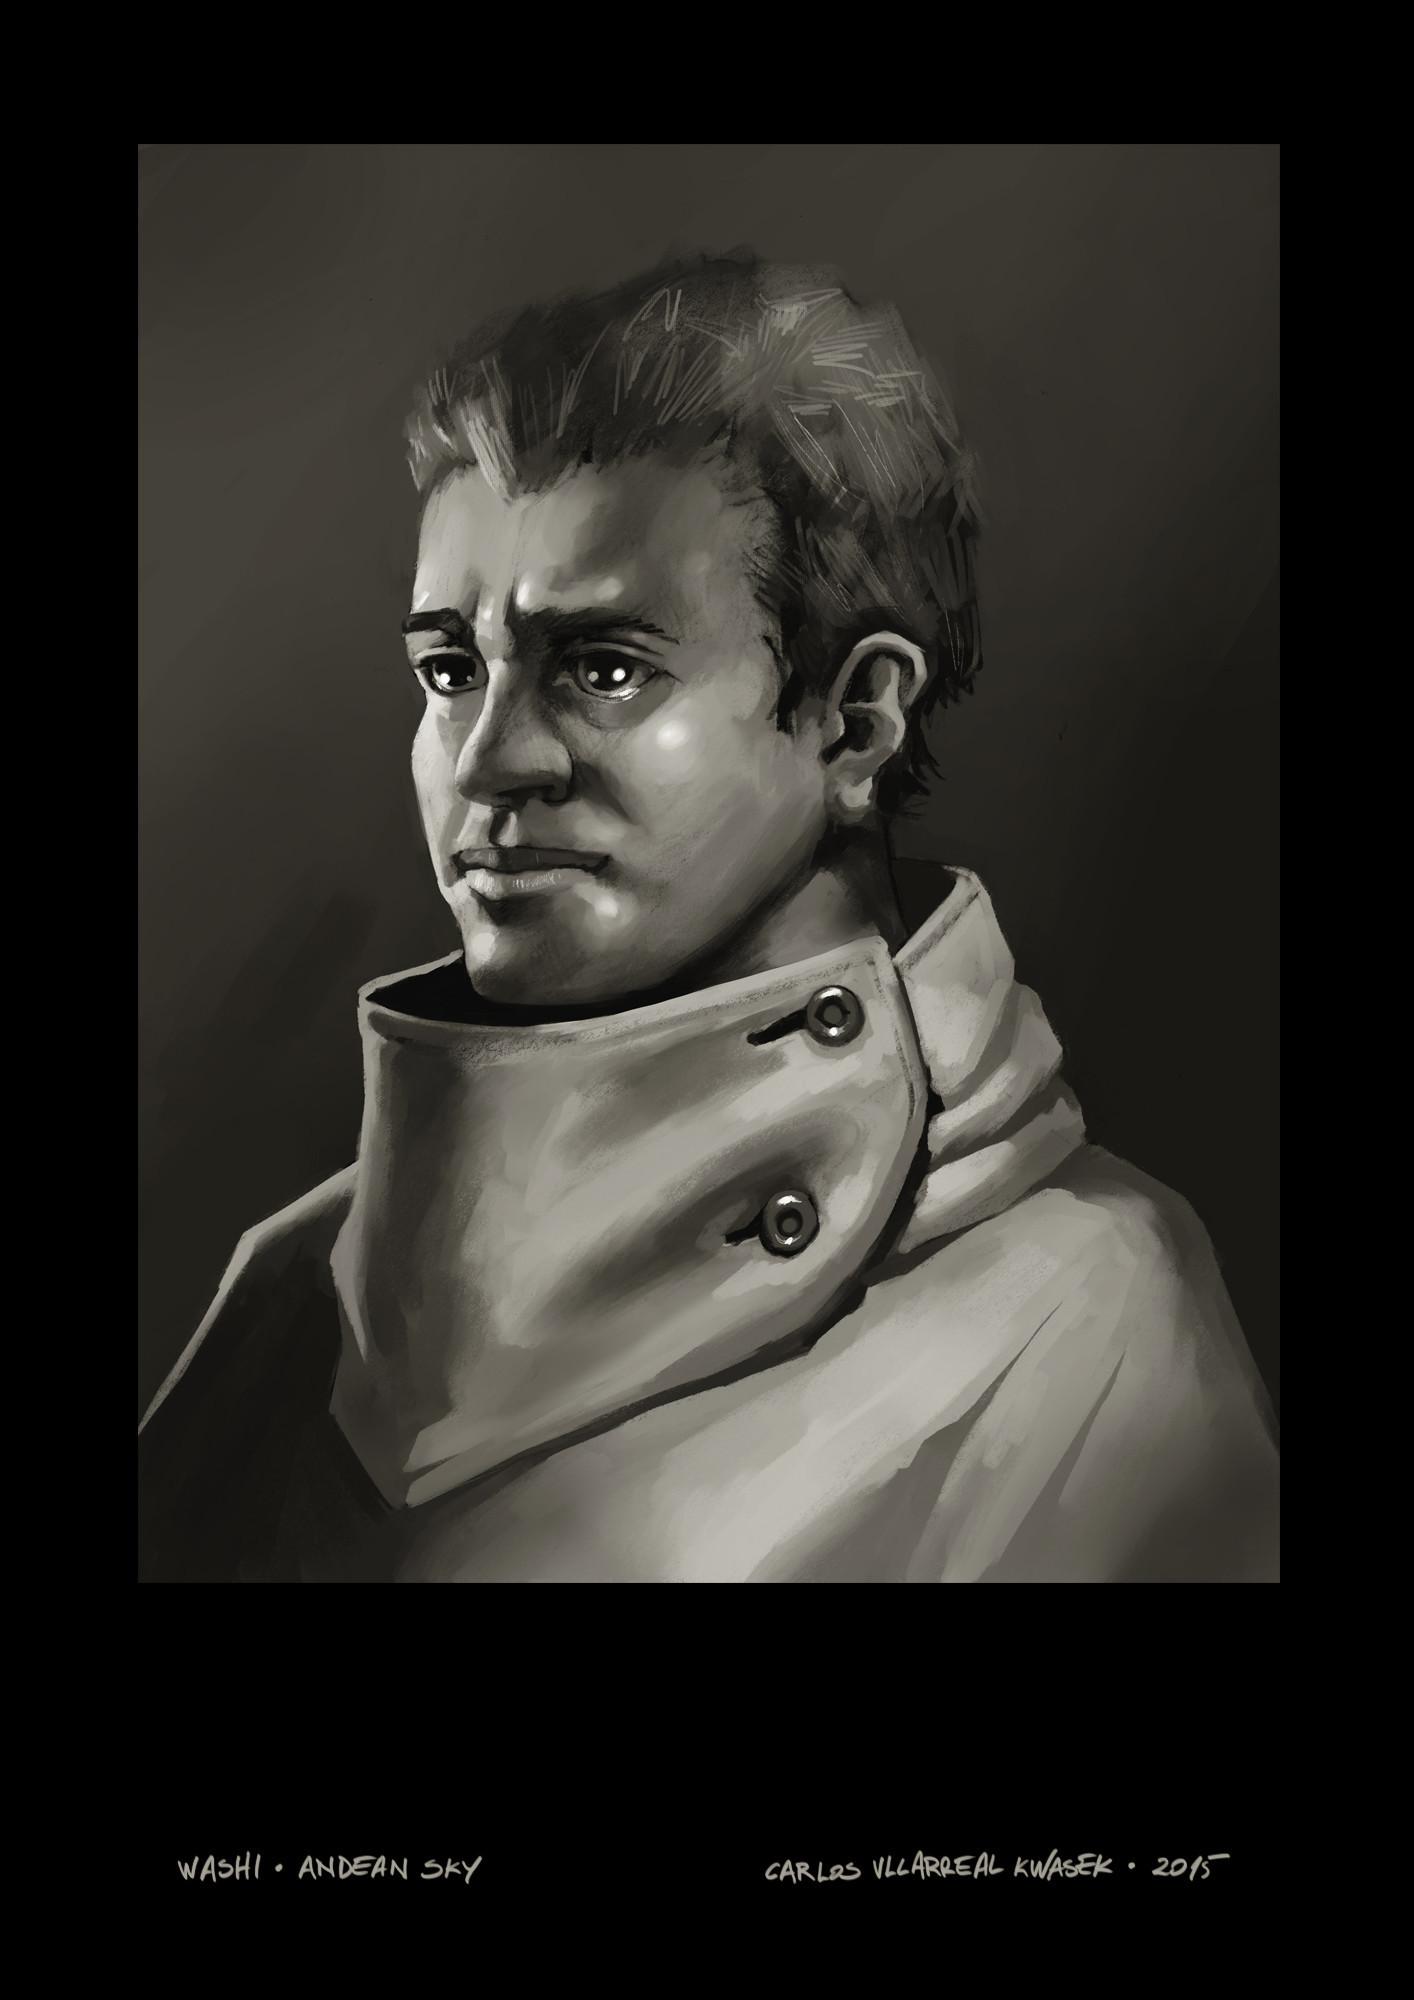 Carlos villarreal kwasek carlos villarreal kwasek washi portrait